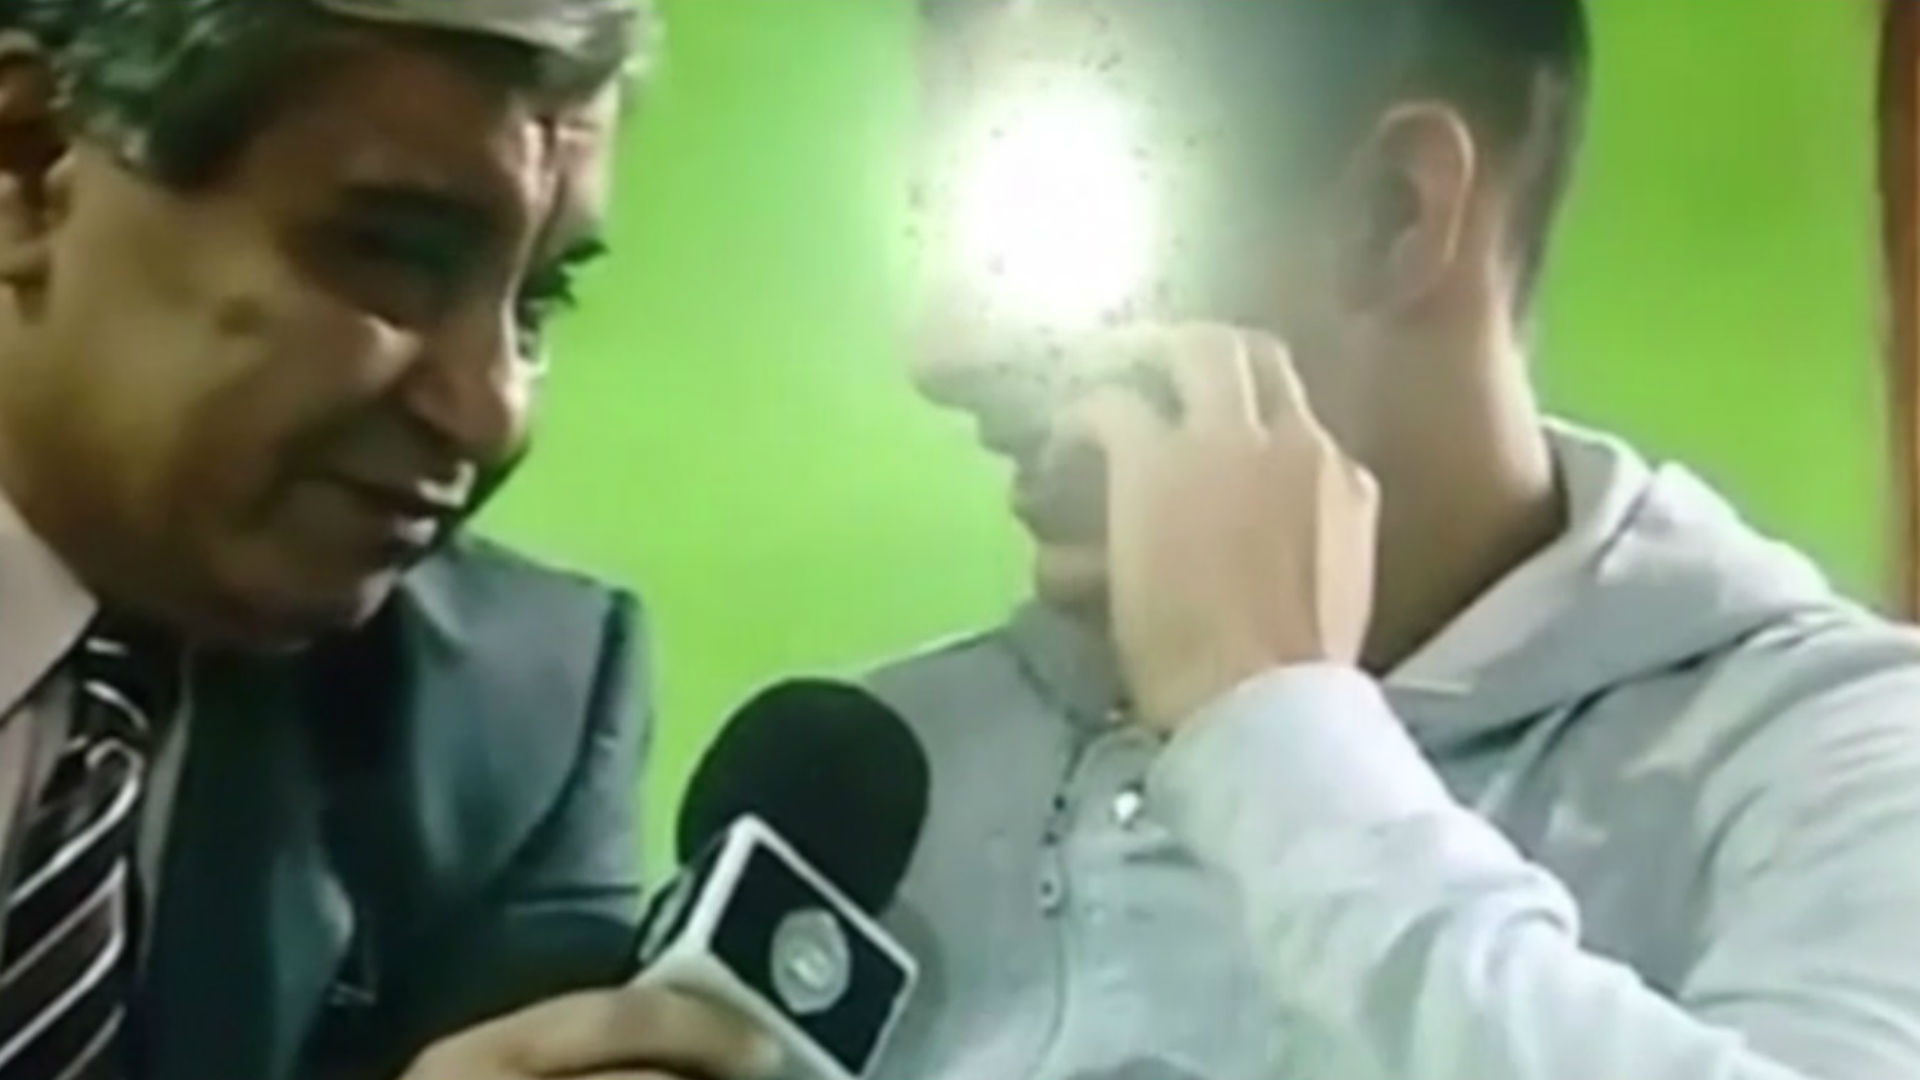 Un titular confesó ser fanático de River — Escándalo en Boca